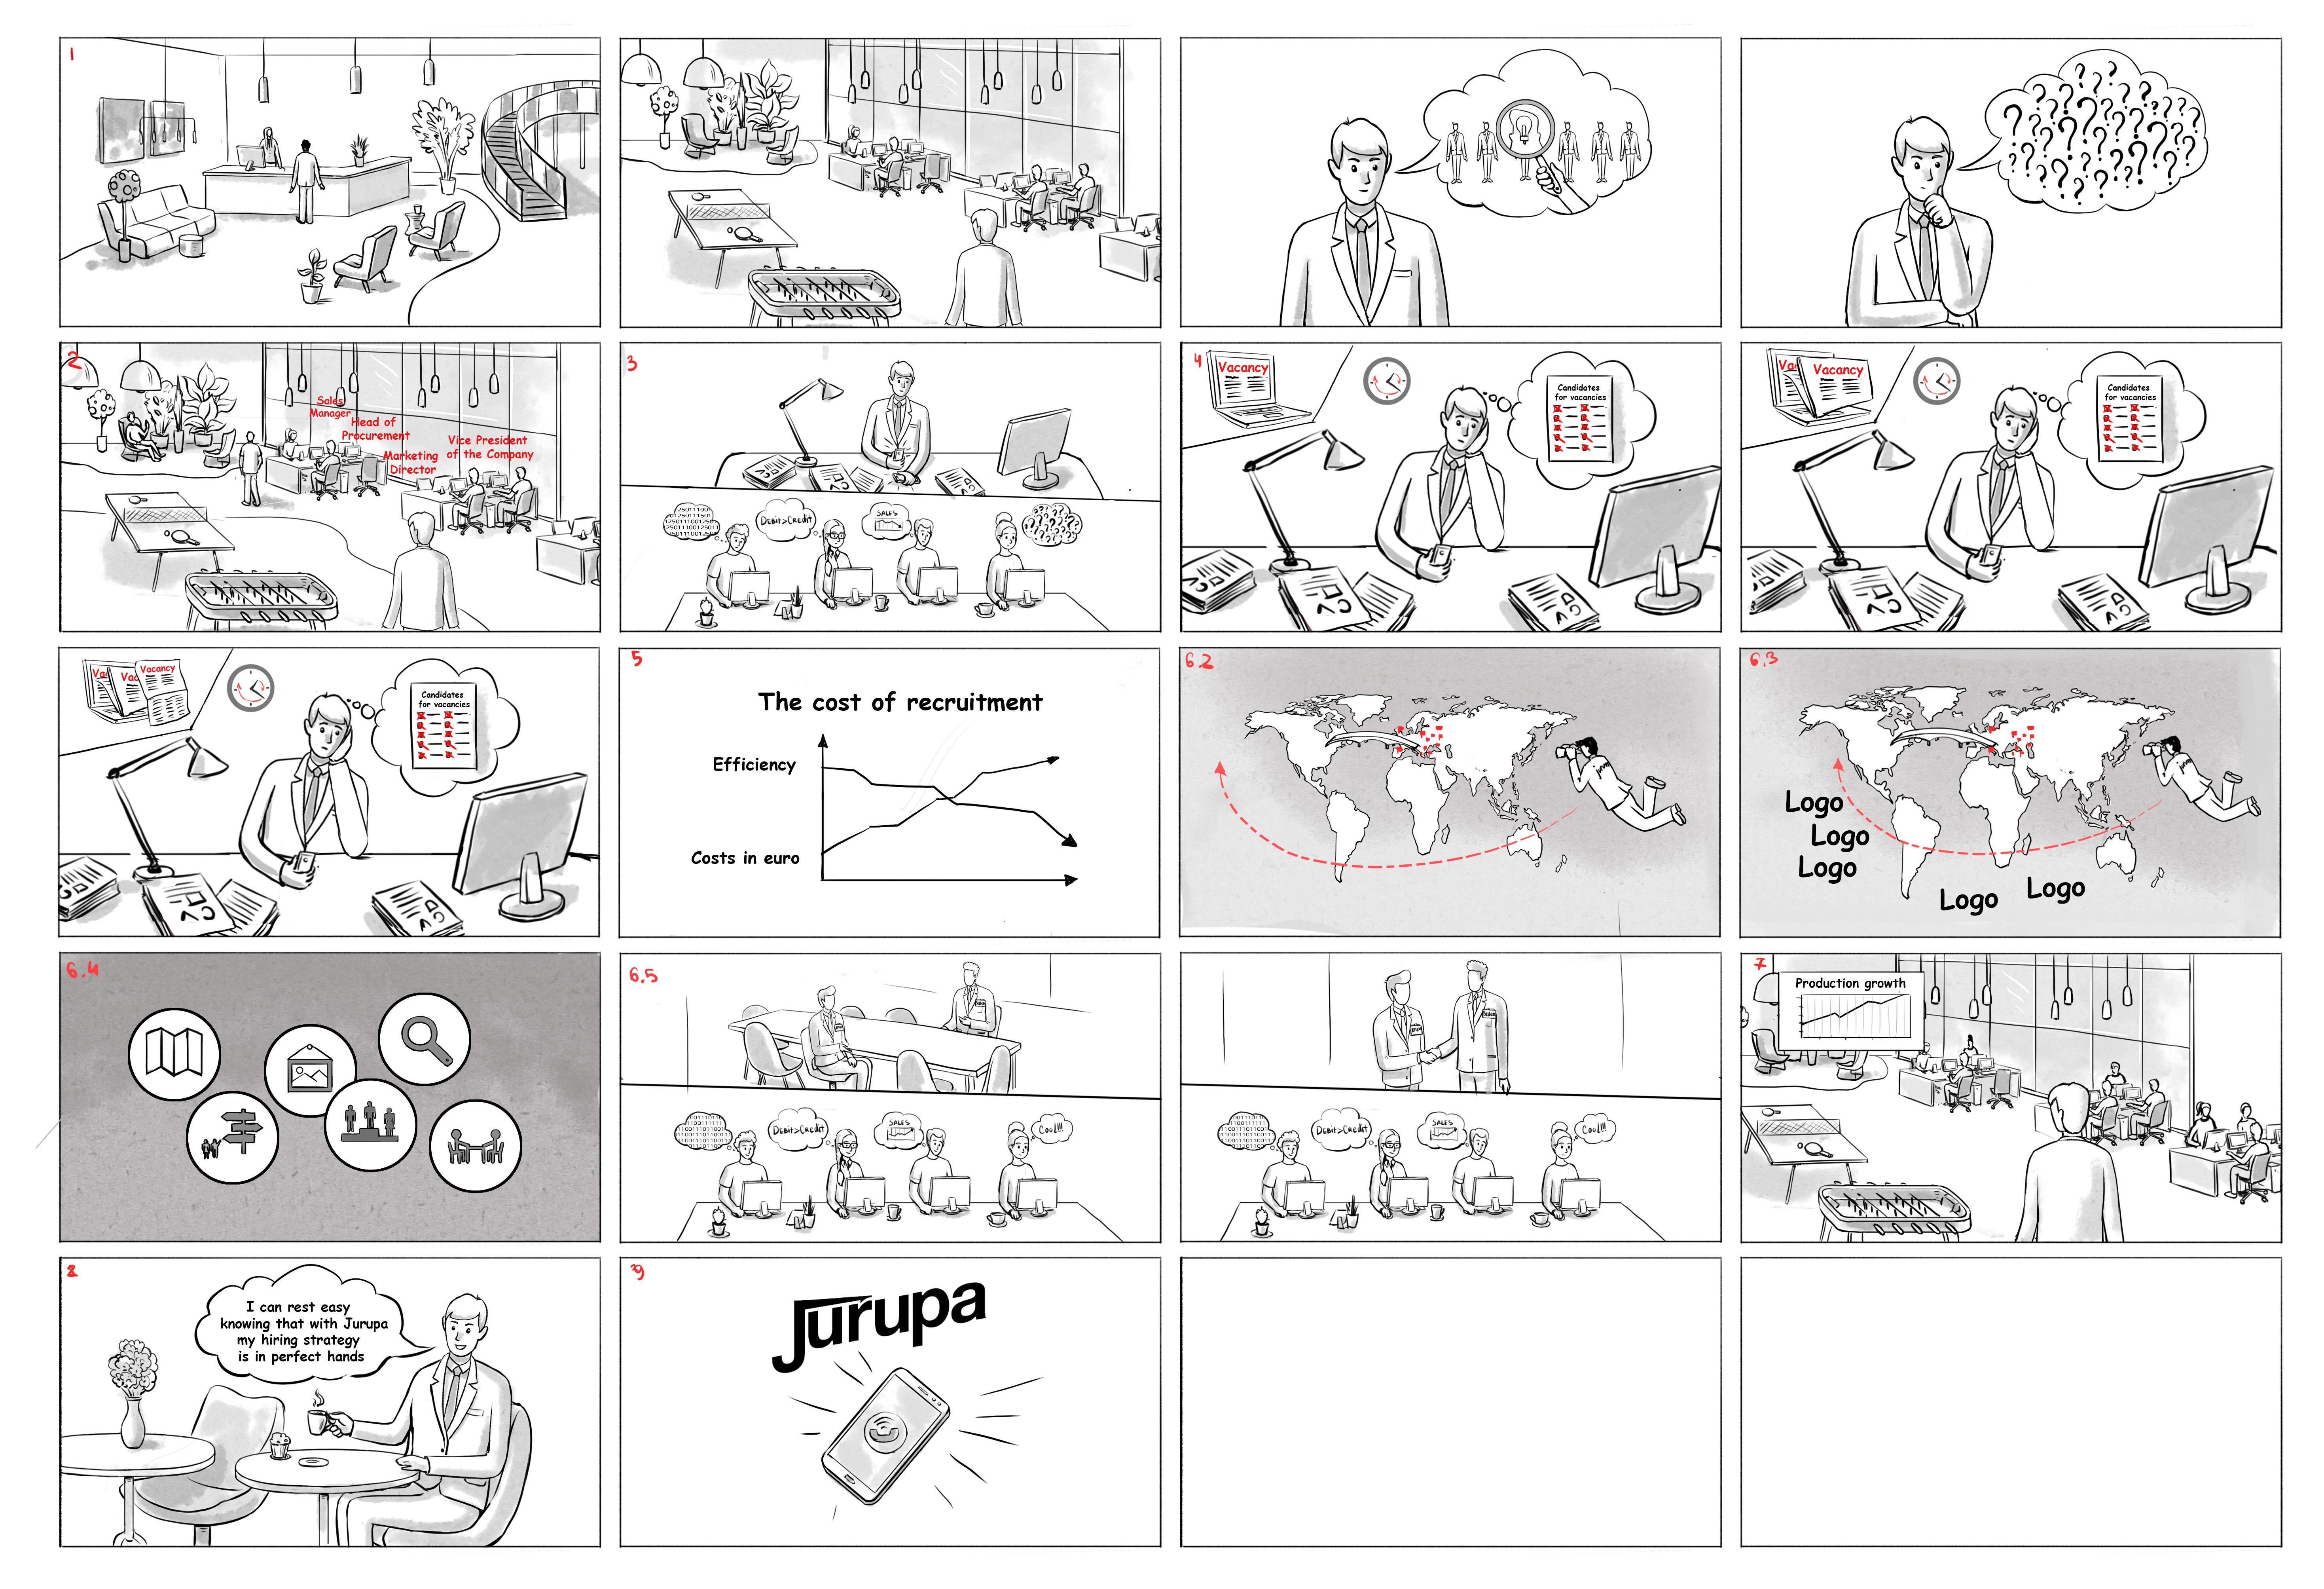 Storyboard to Jurupa HR Video